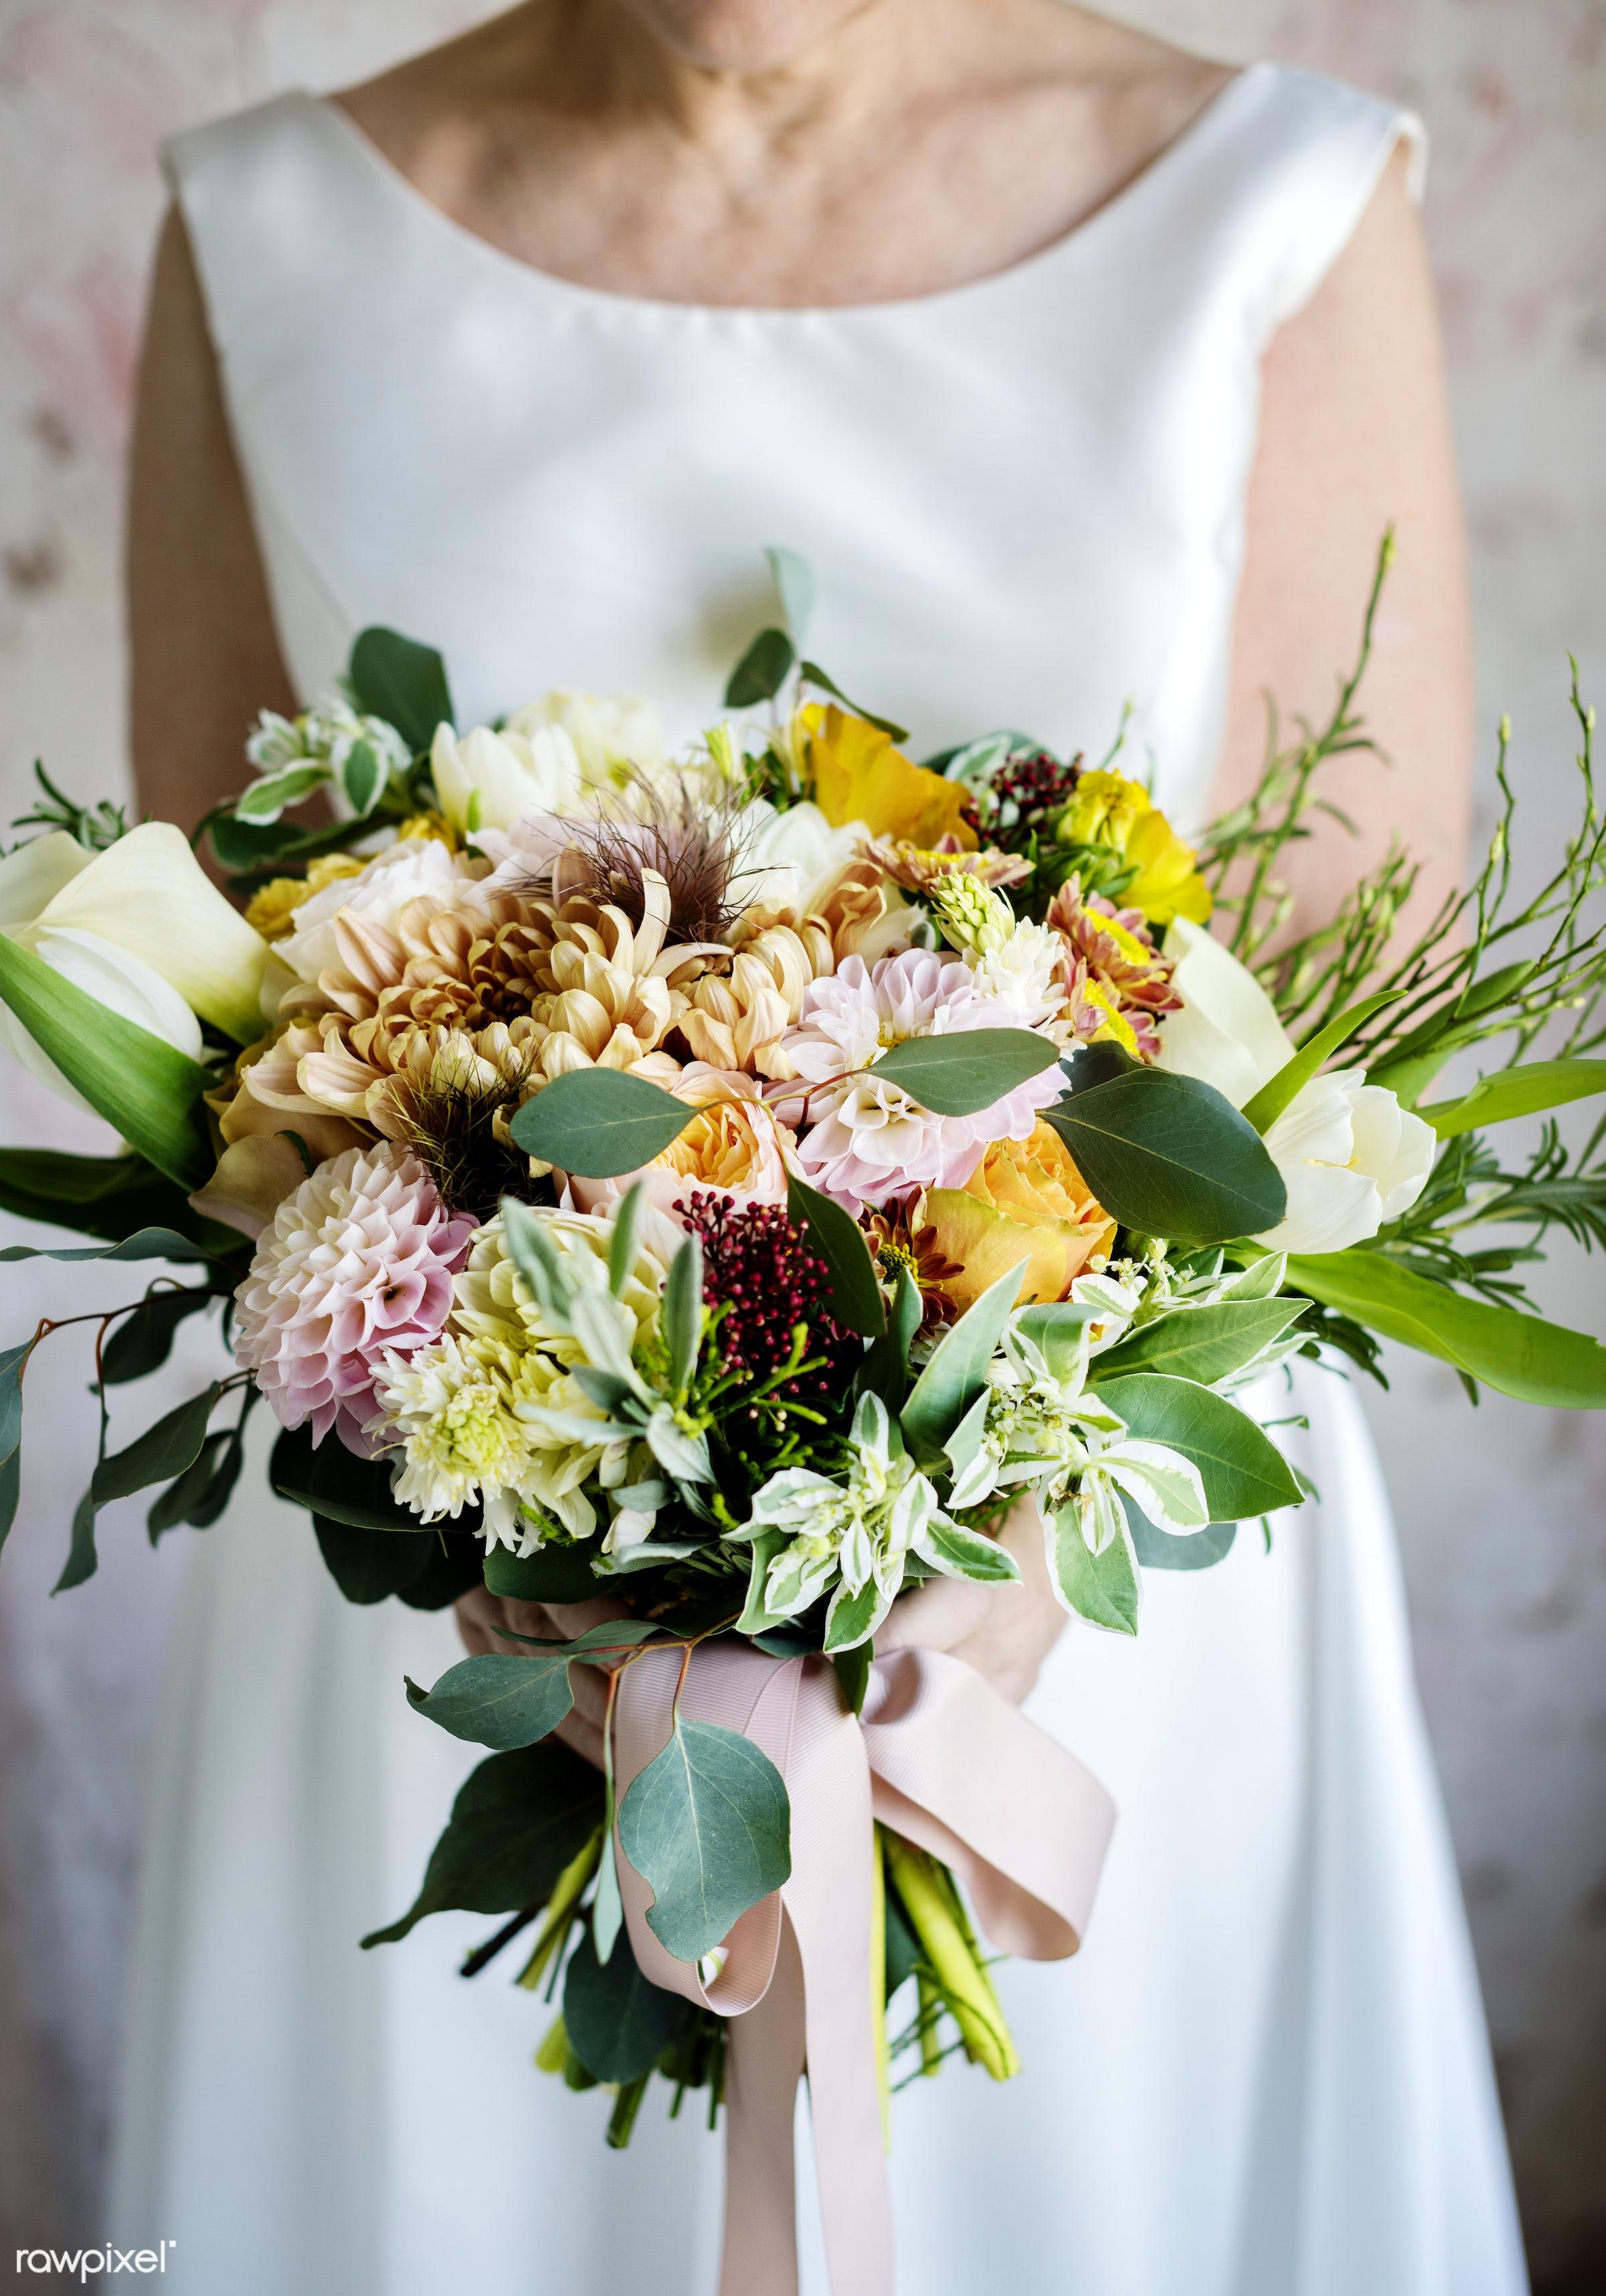 bouquet, holding, diverse, white dress, tulips, caucasian, real, nature, skimmia rubella, fresh, hands, woman, event, bride...